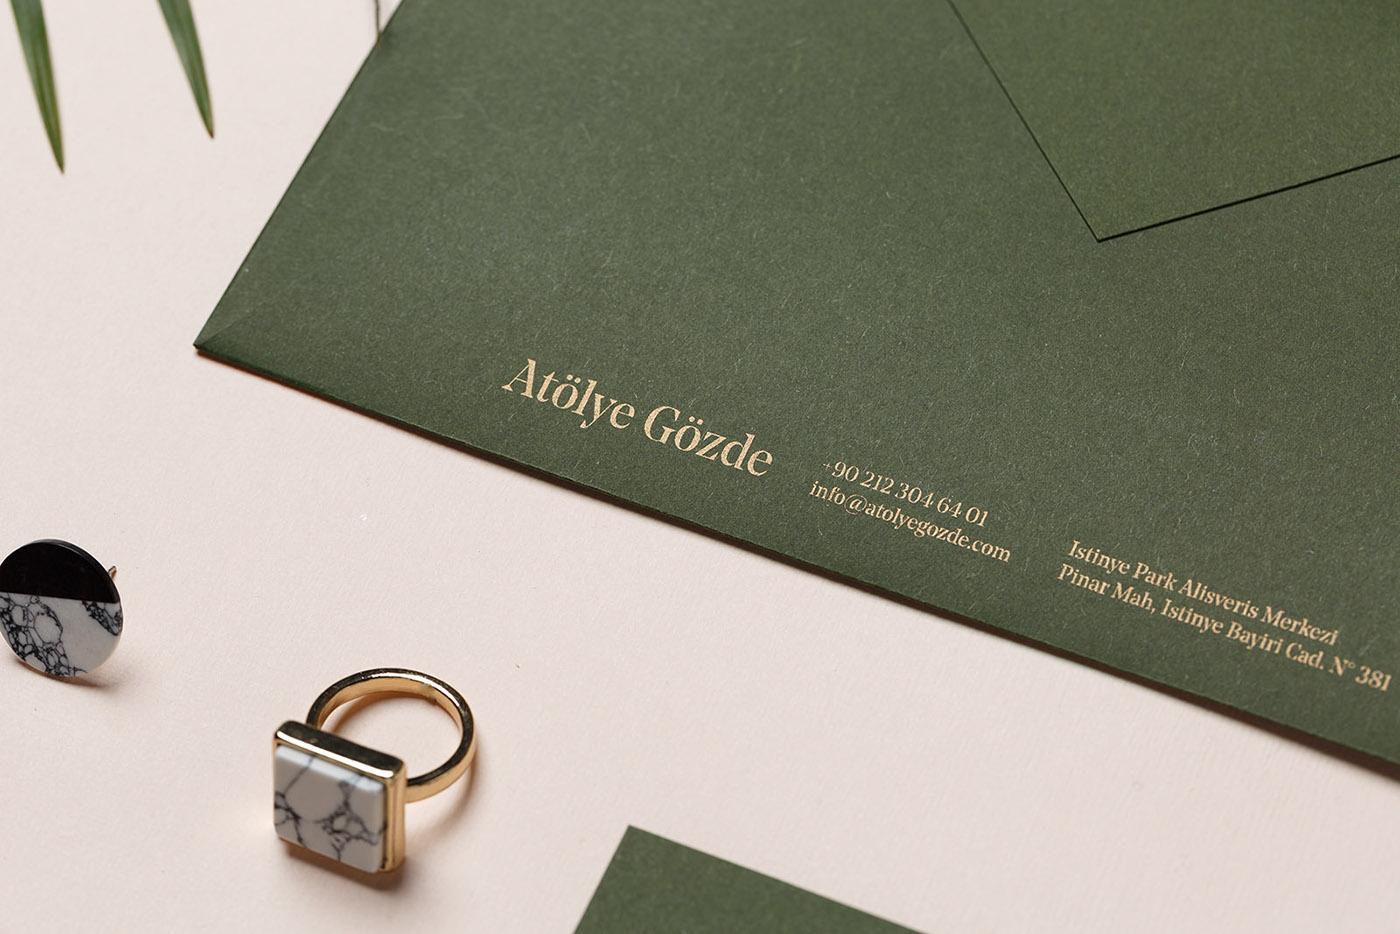 Atolye Gozde Branding